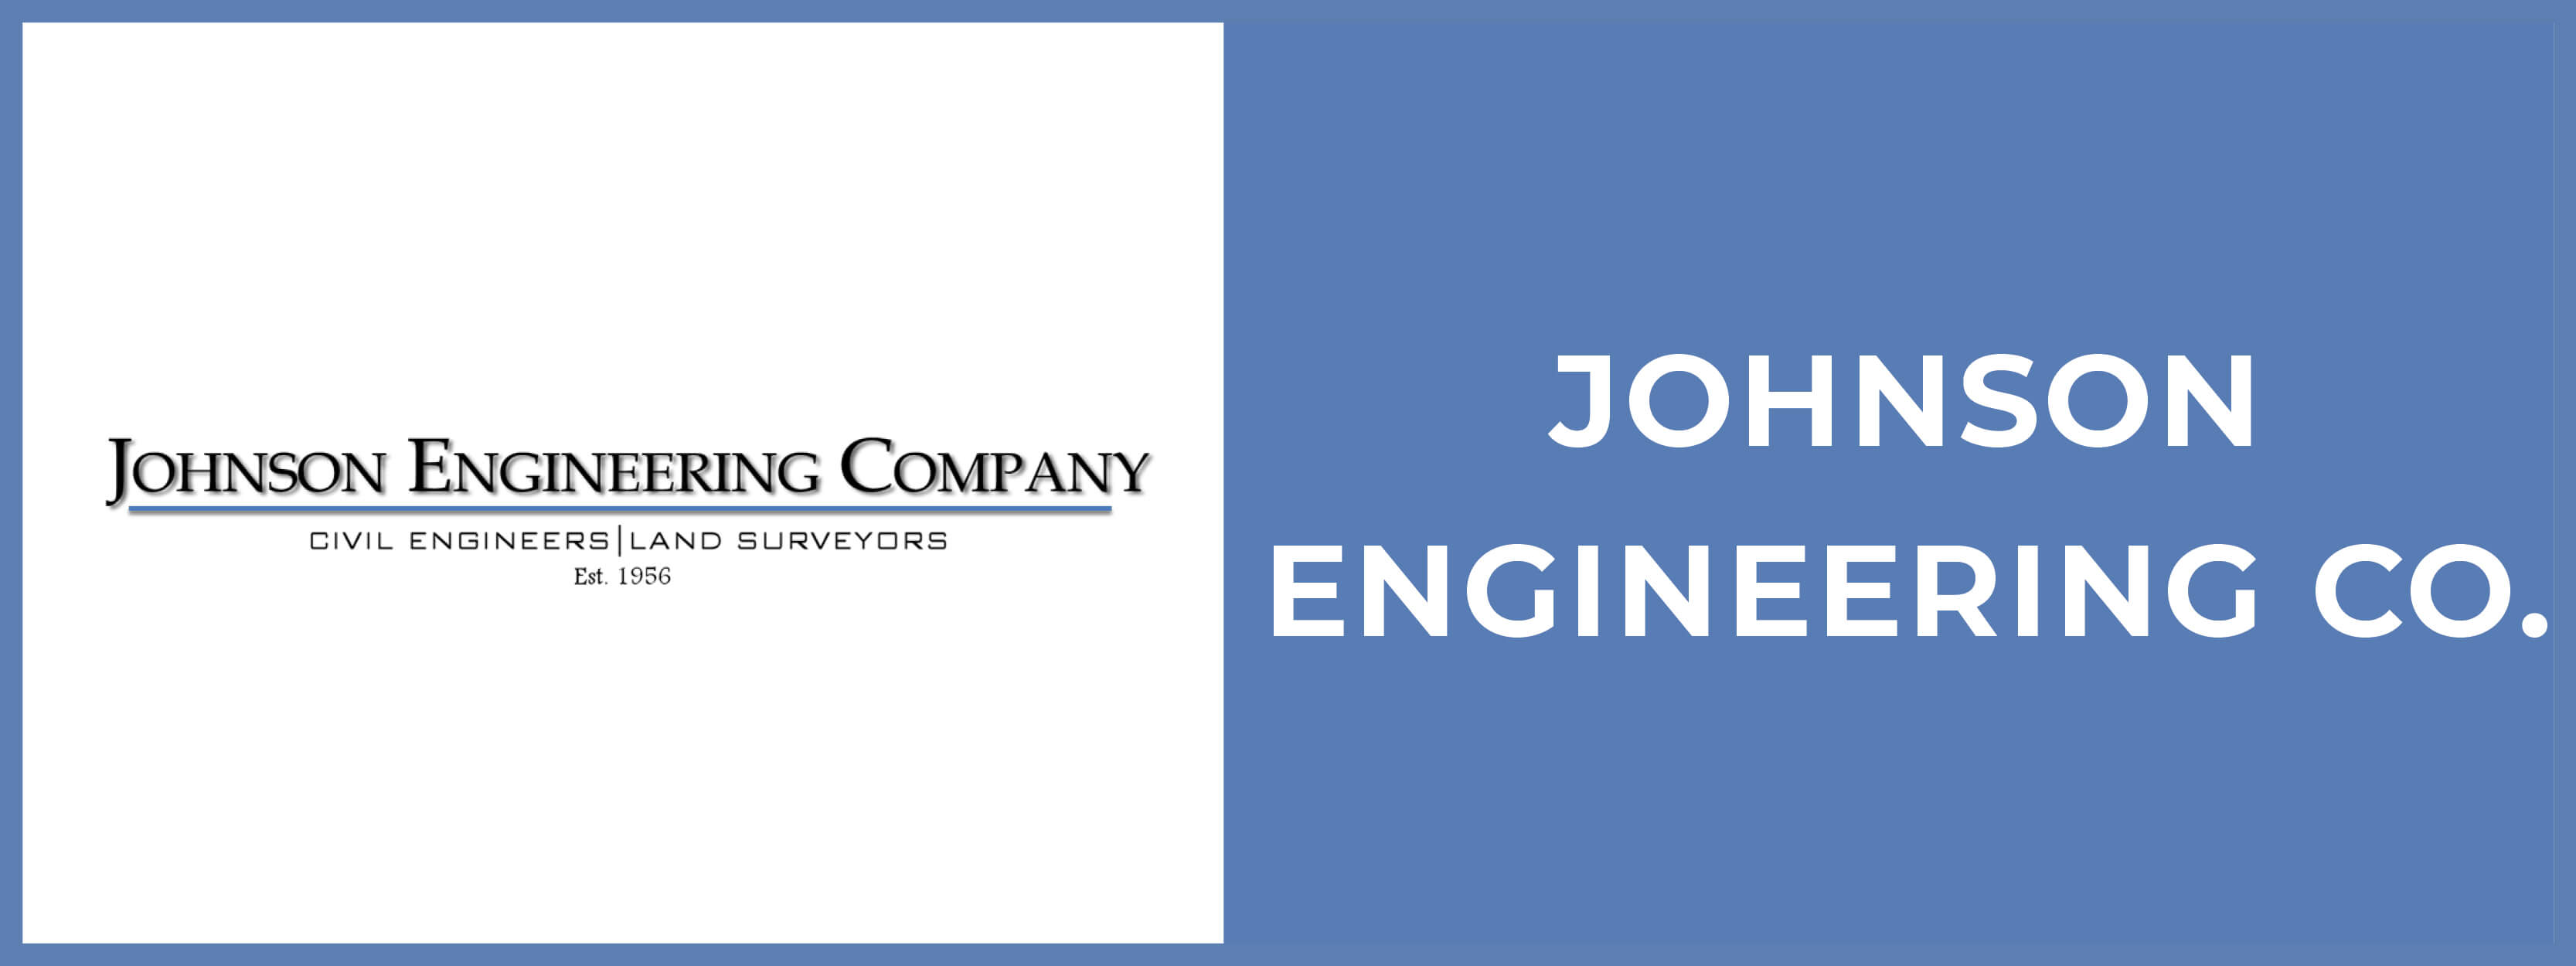 Johnson Engineering Co Button